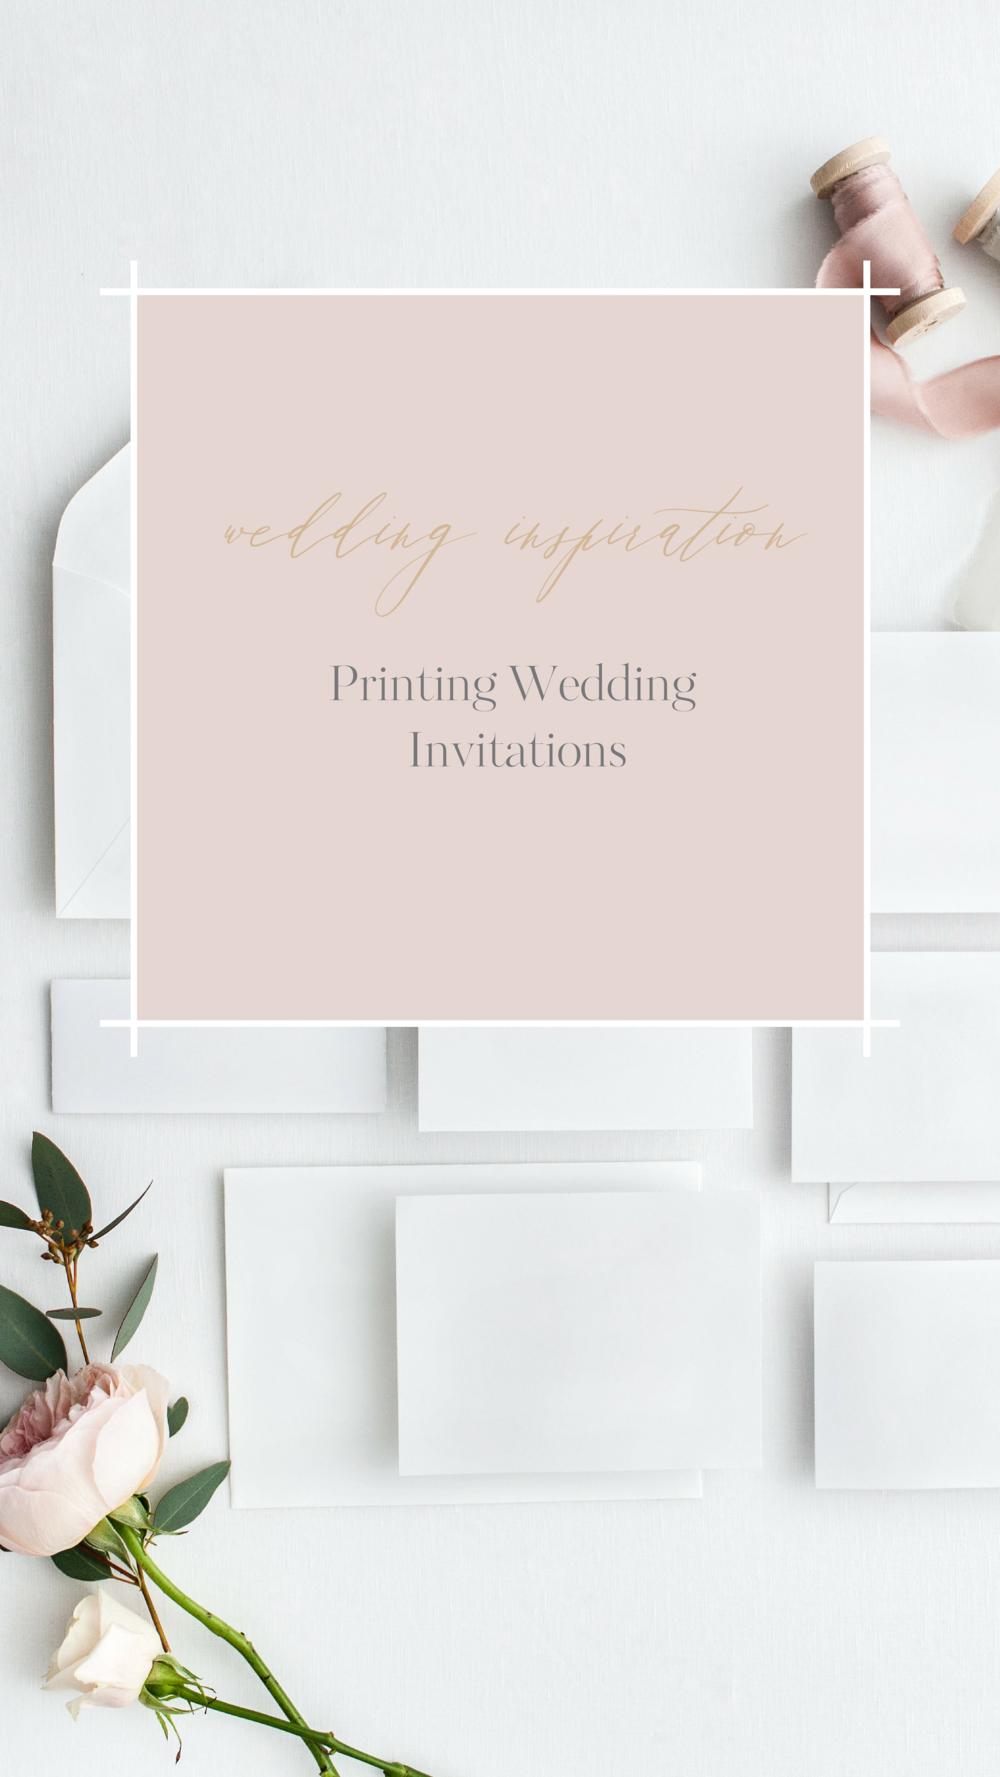 Print Wedding Invitations.png